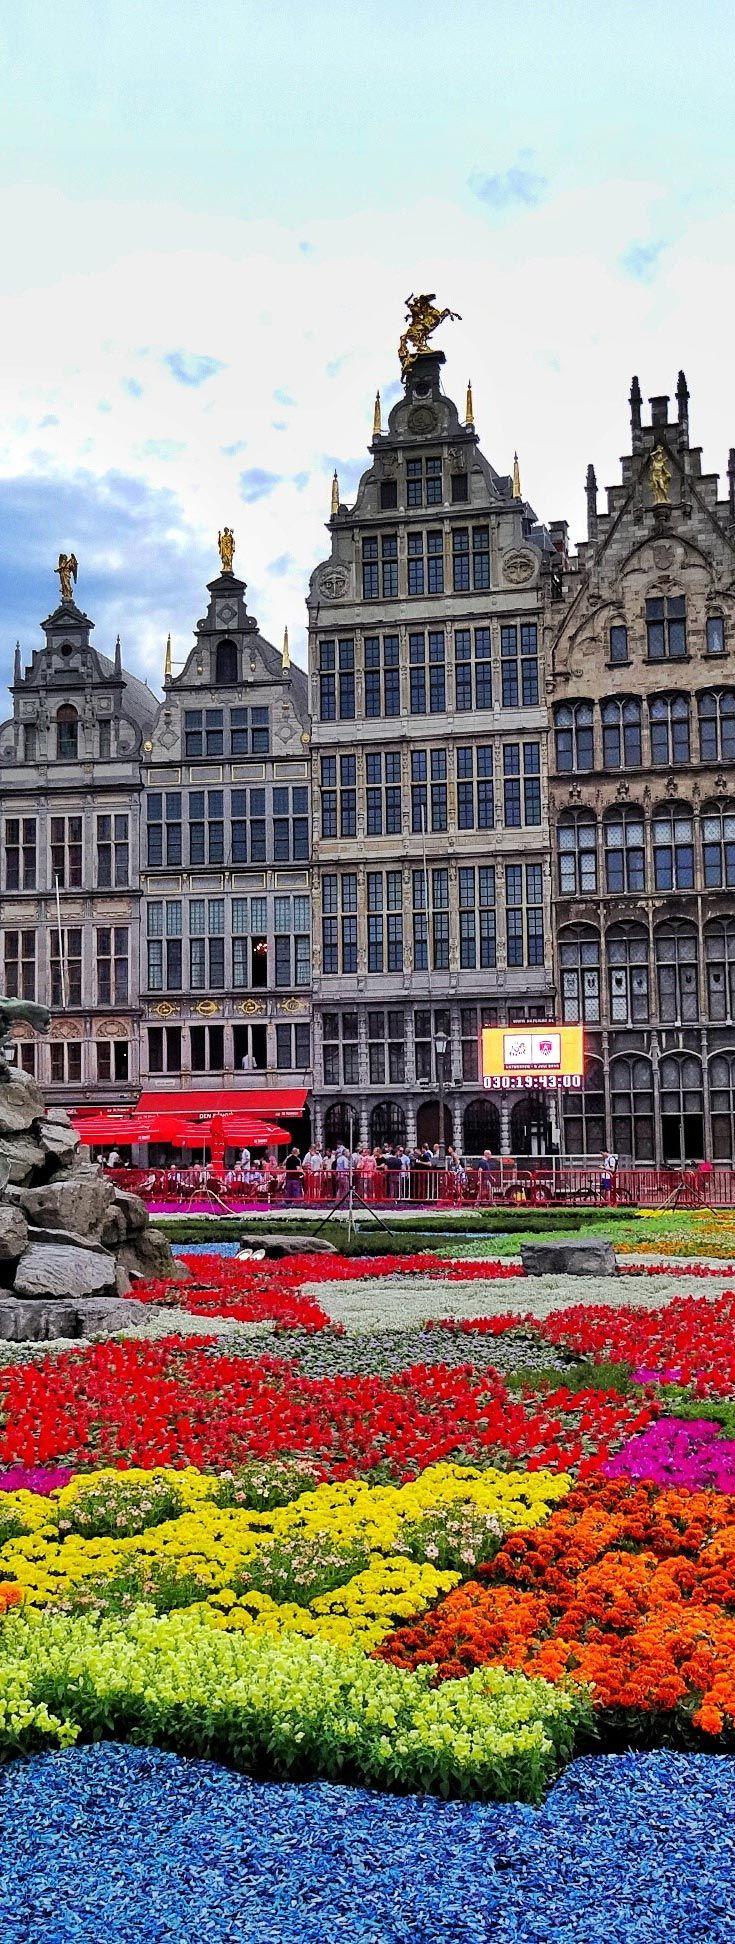 Flower Carpet- Grand Place at Antwerp | Belgium